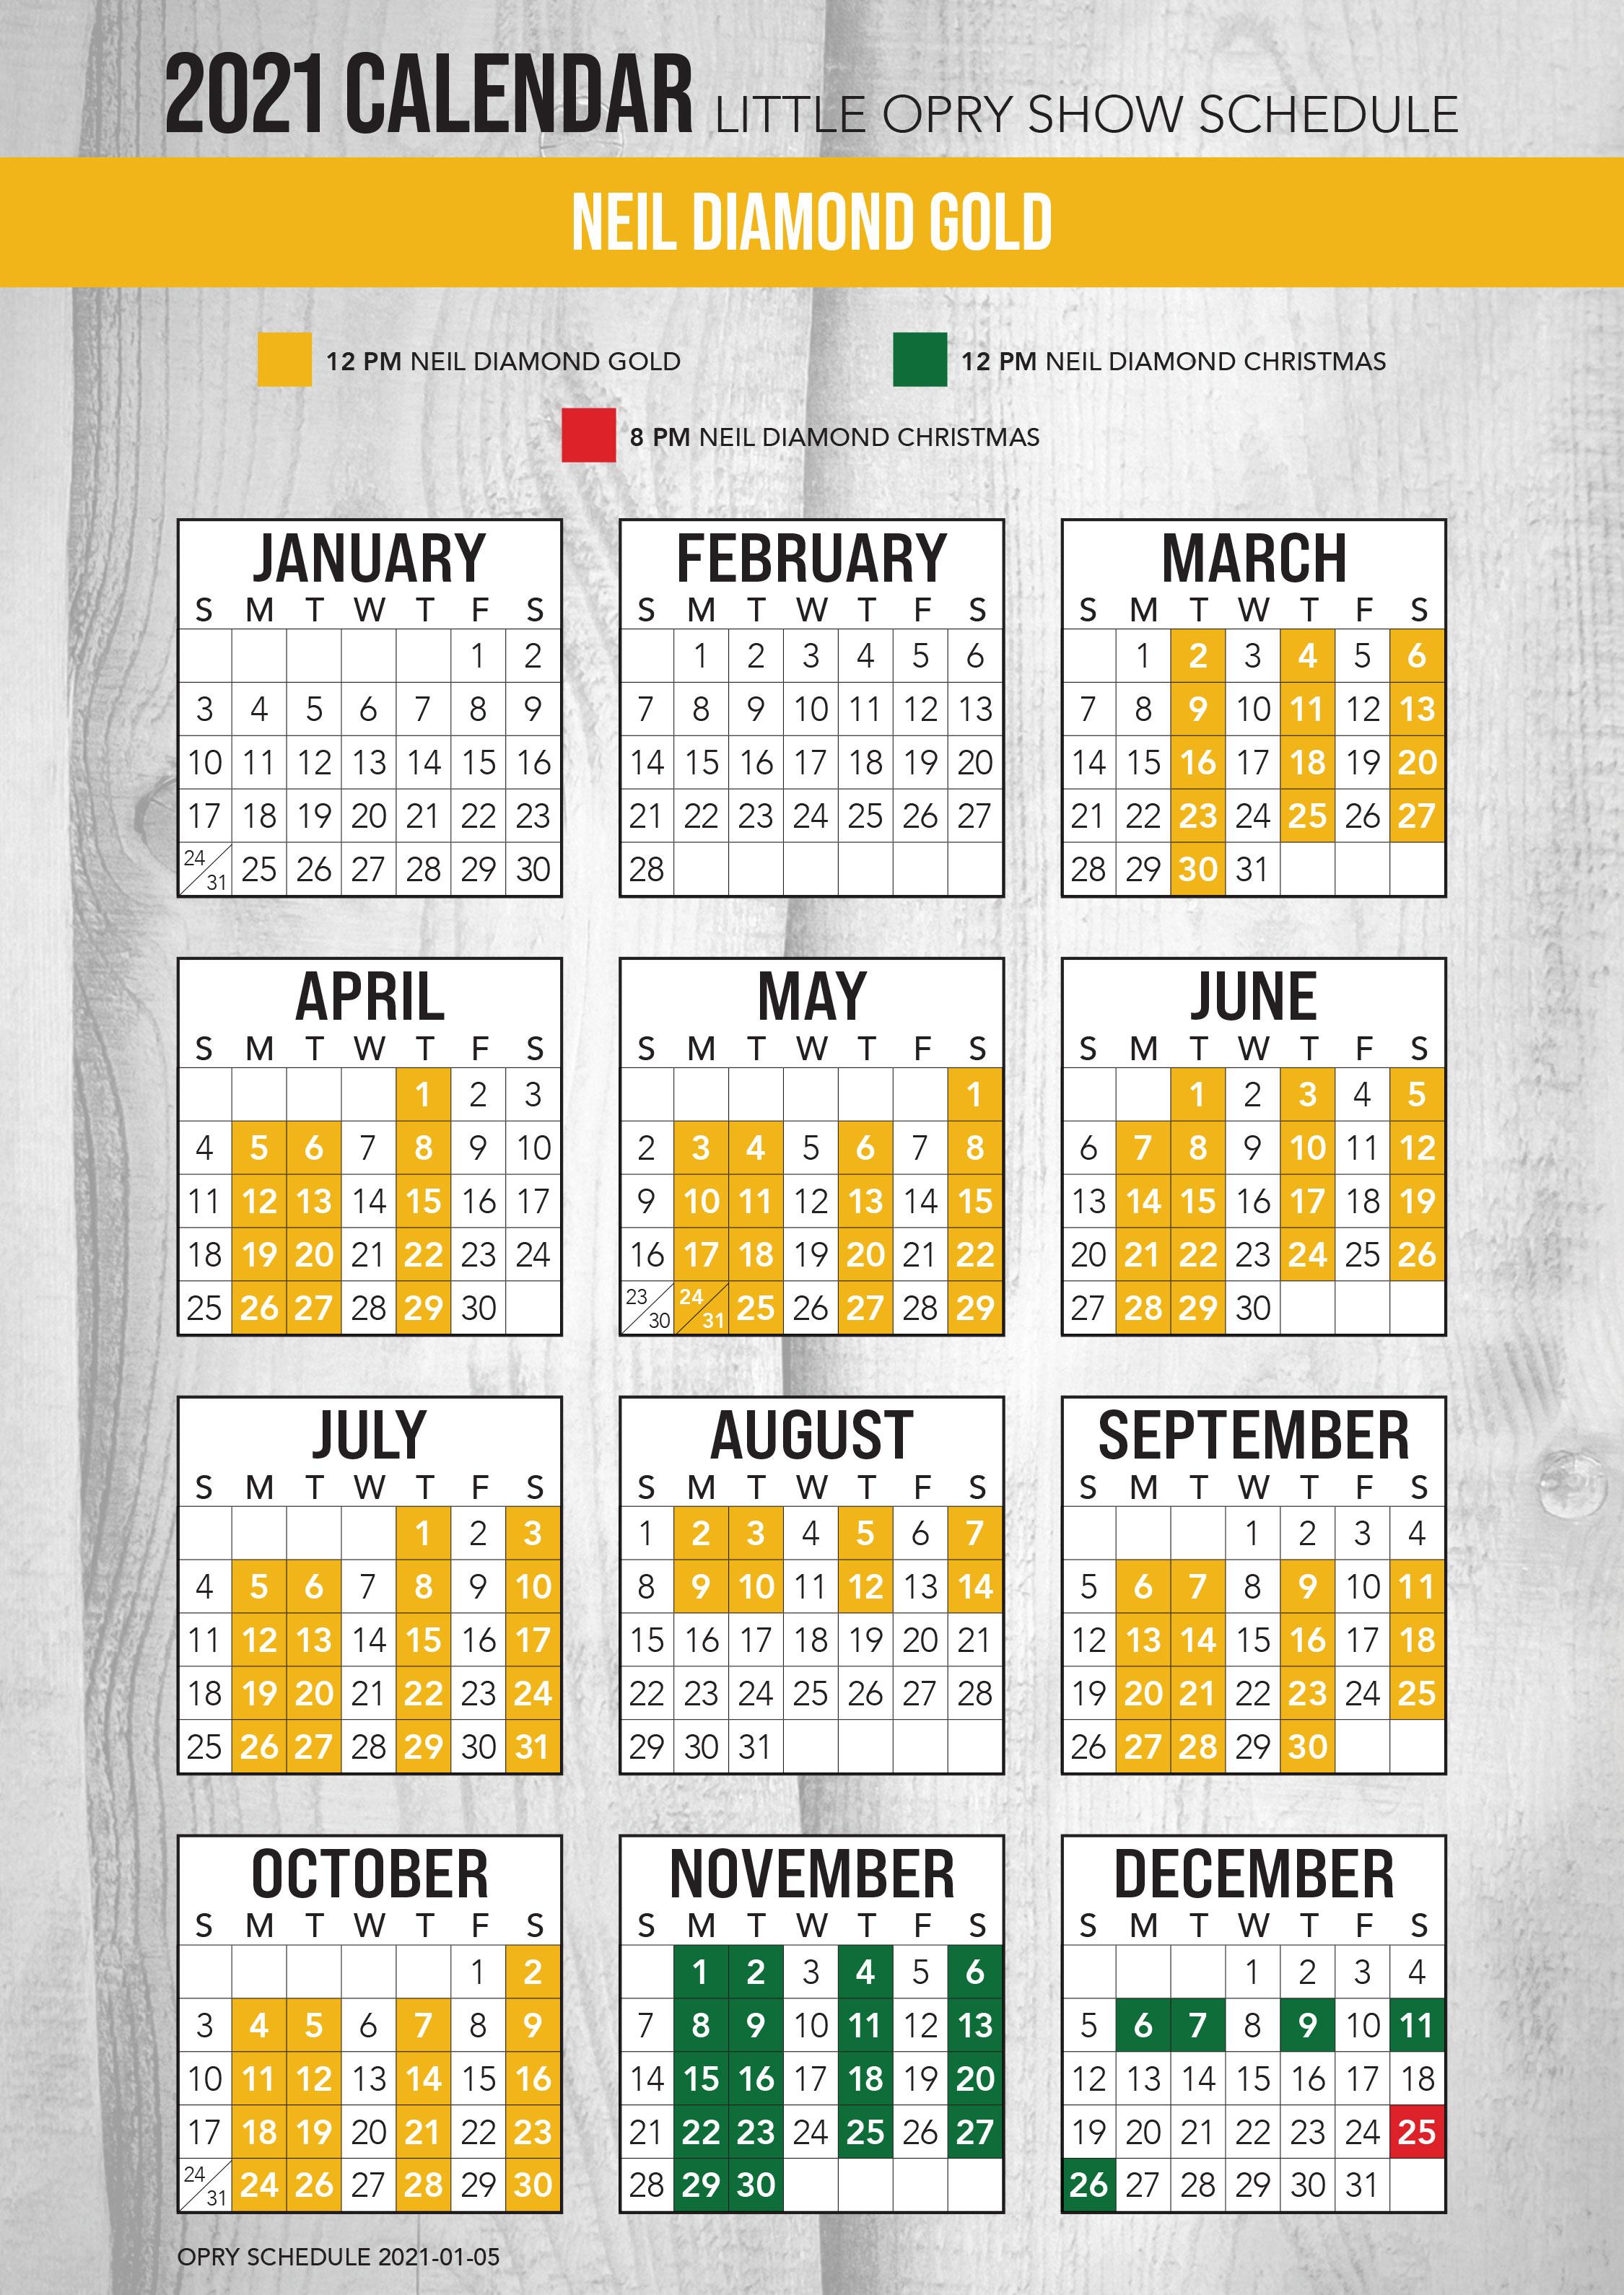 Neil Diamond Gold 2021 Schedule